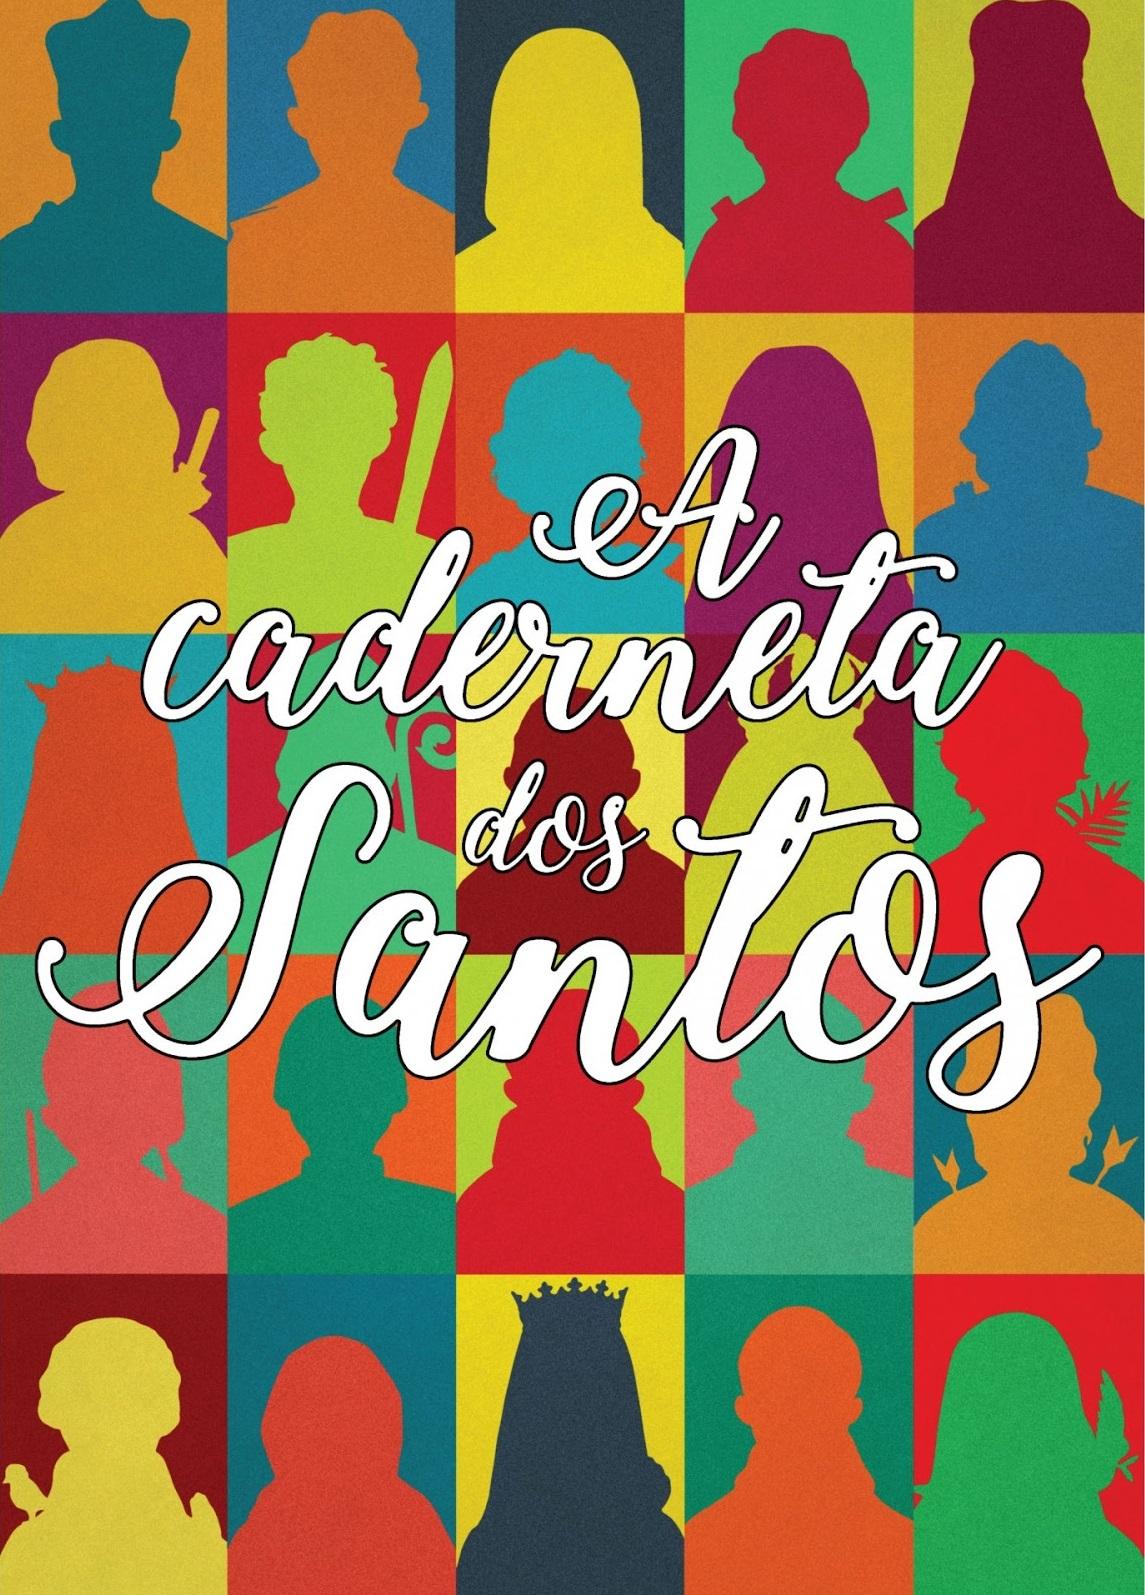 Caderneta dos Santos